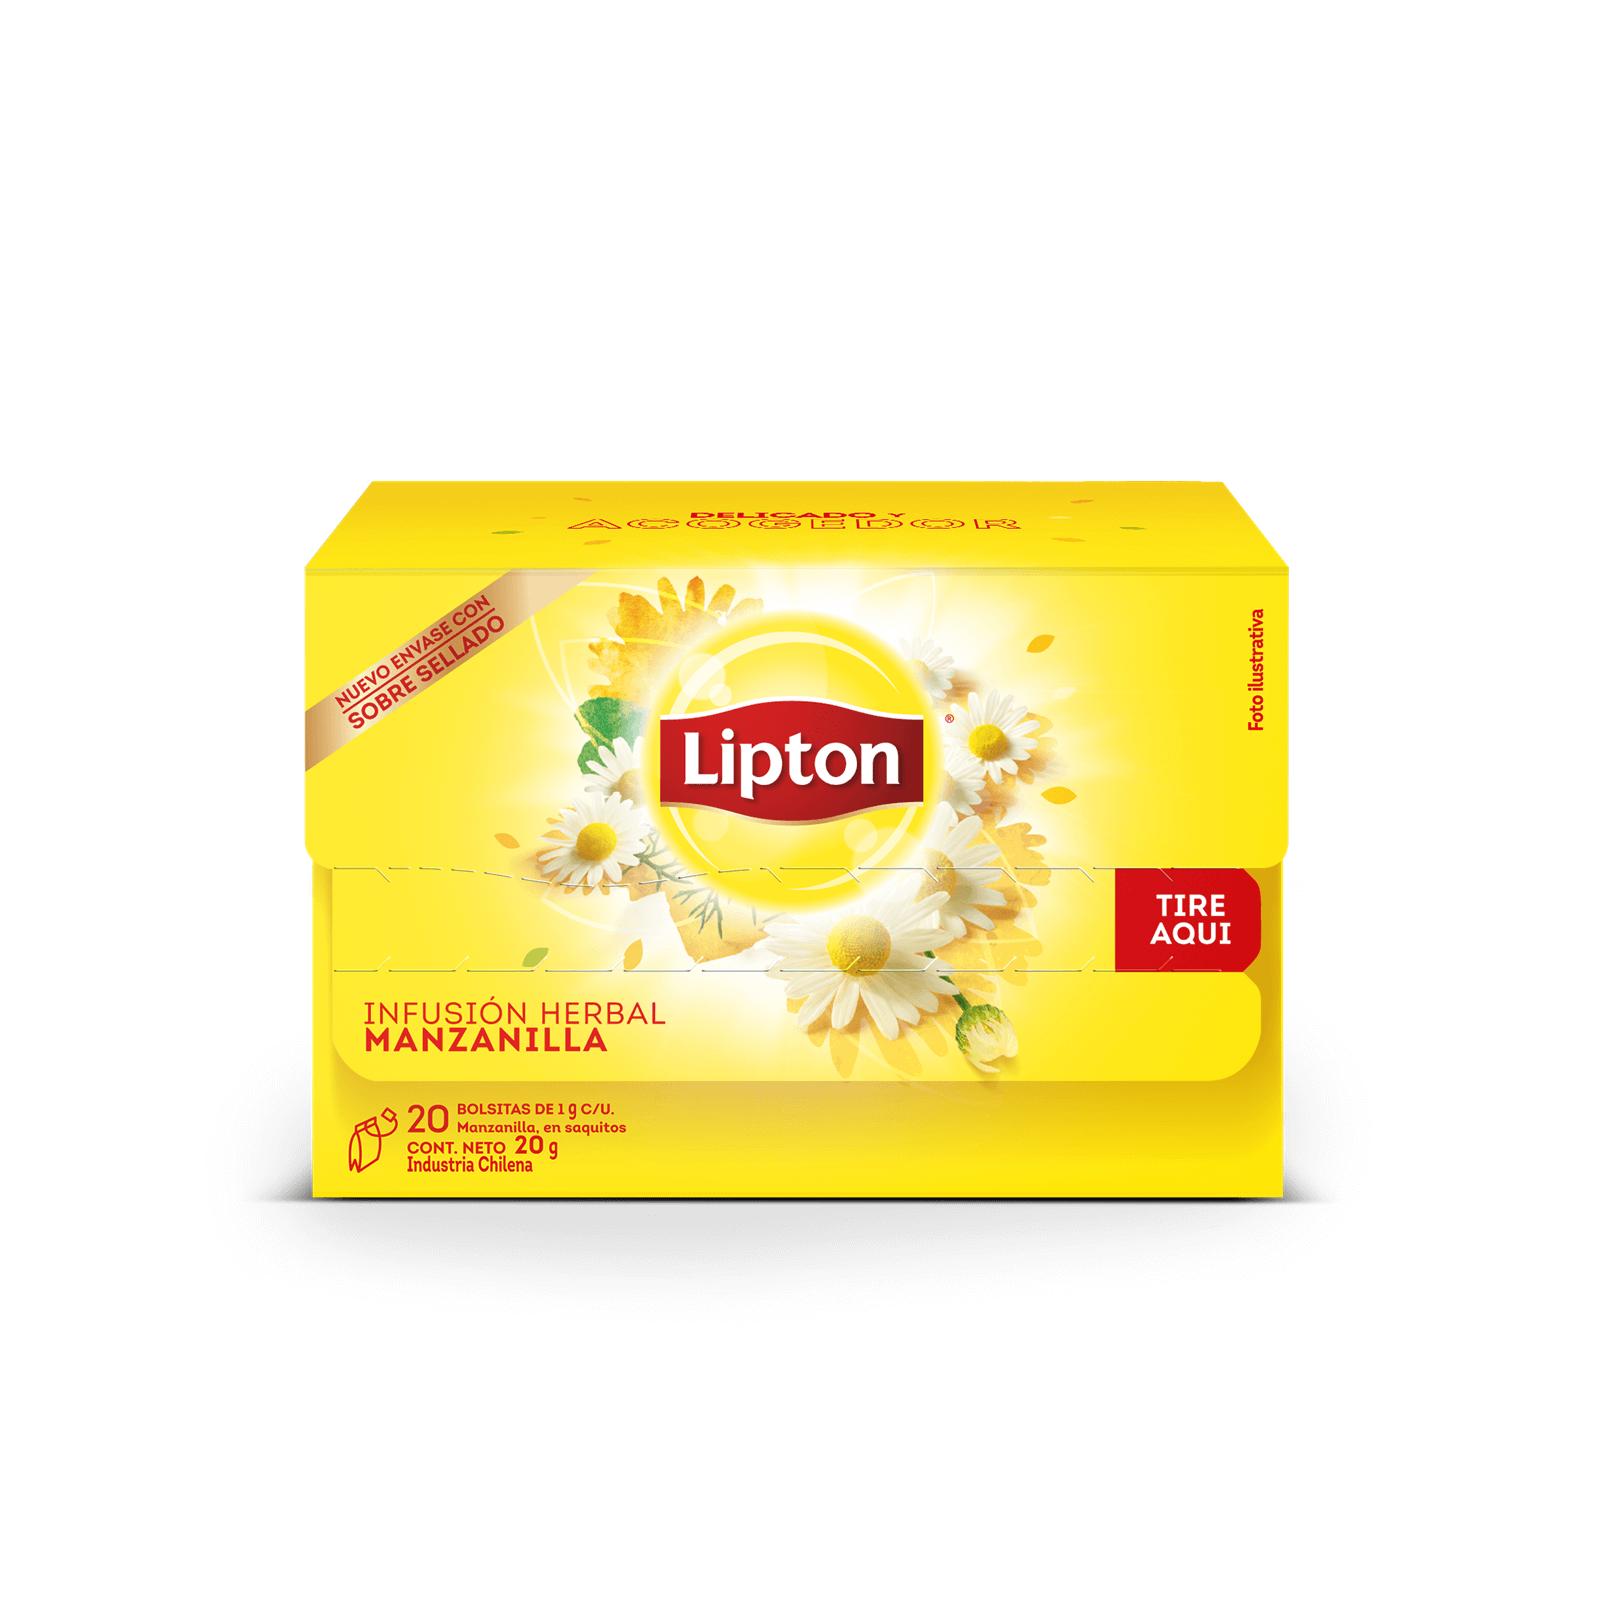 Infusión  Herbal Lipton Manzanilla